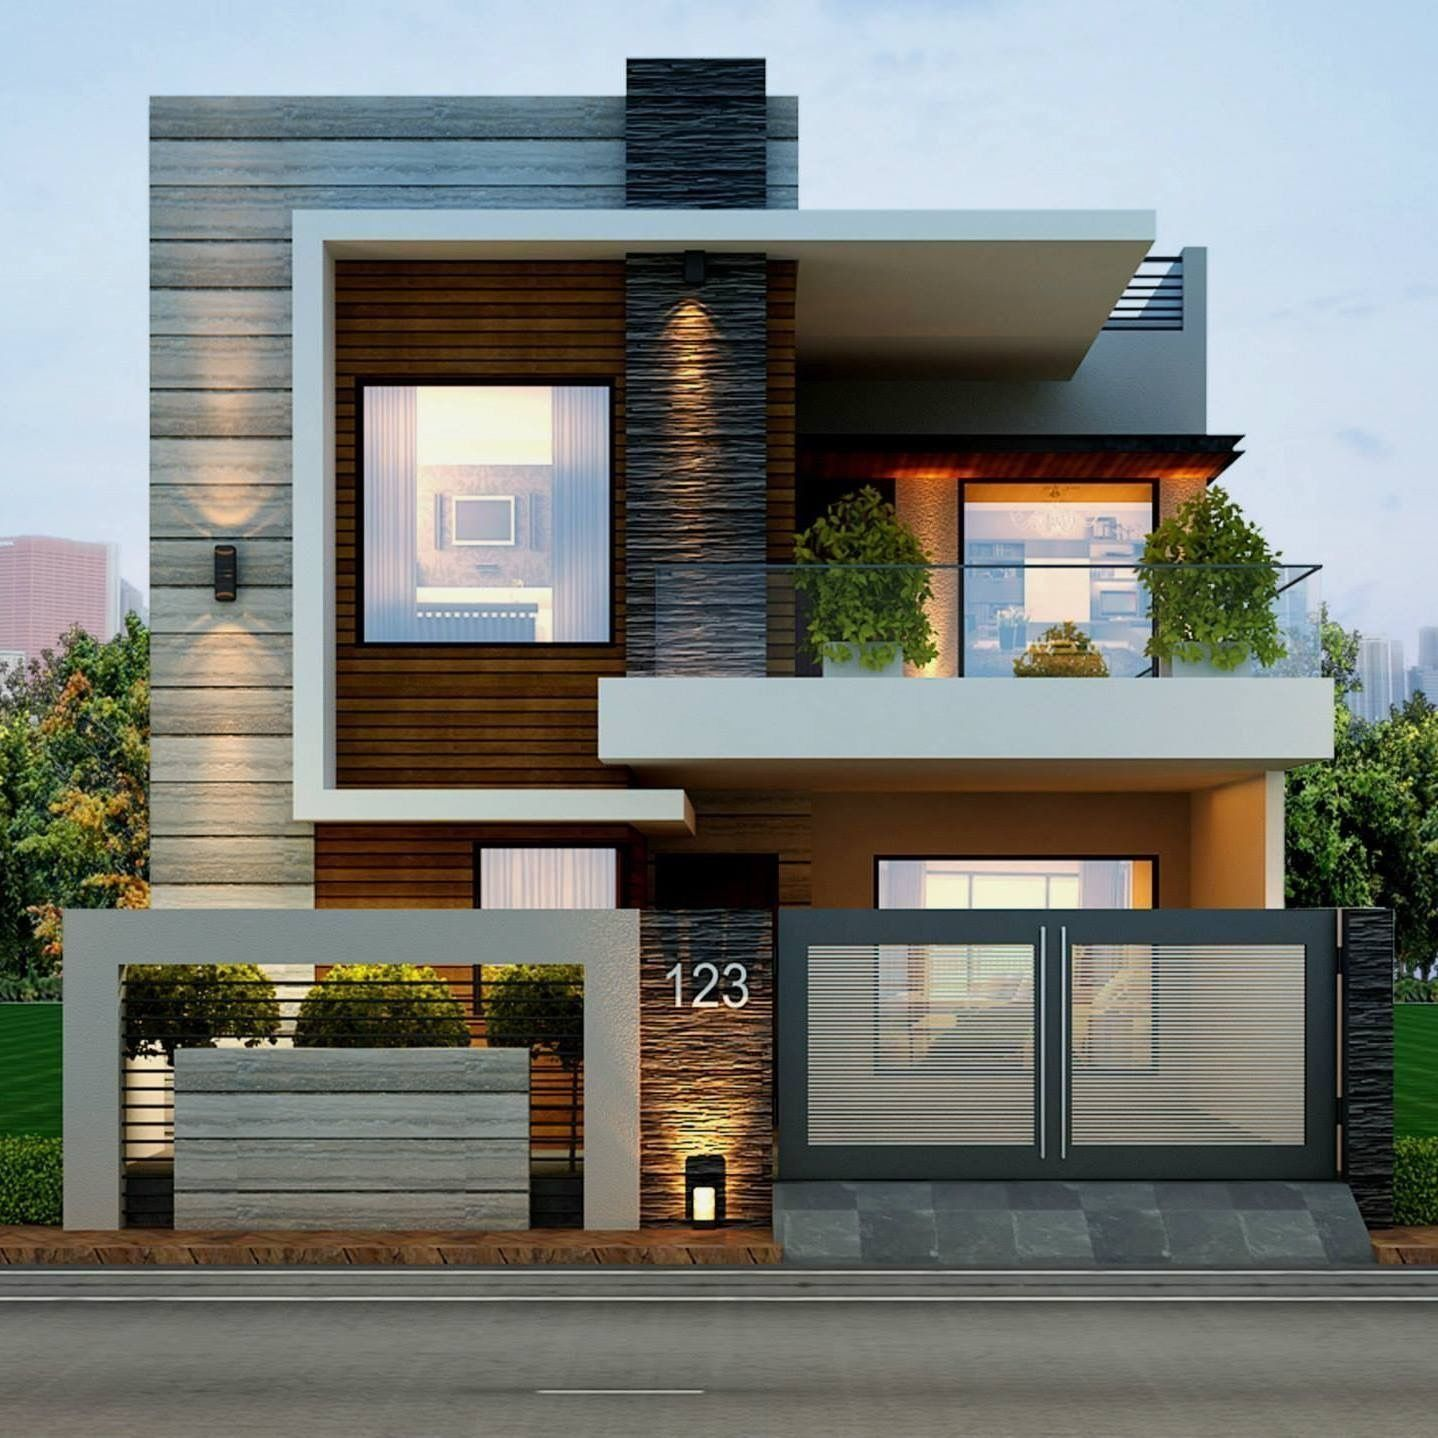 Modern Architecture Ideas 172 Decoratoo Modern Exterior House Designs Bungalow House Design Duplex House Design